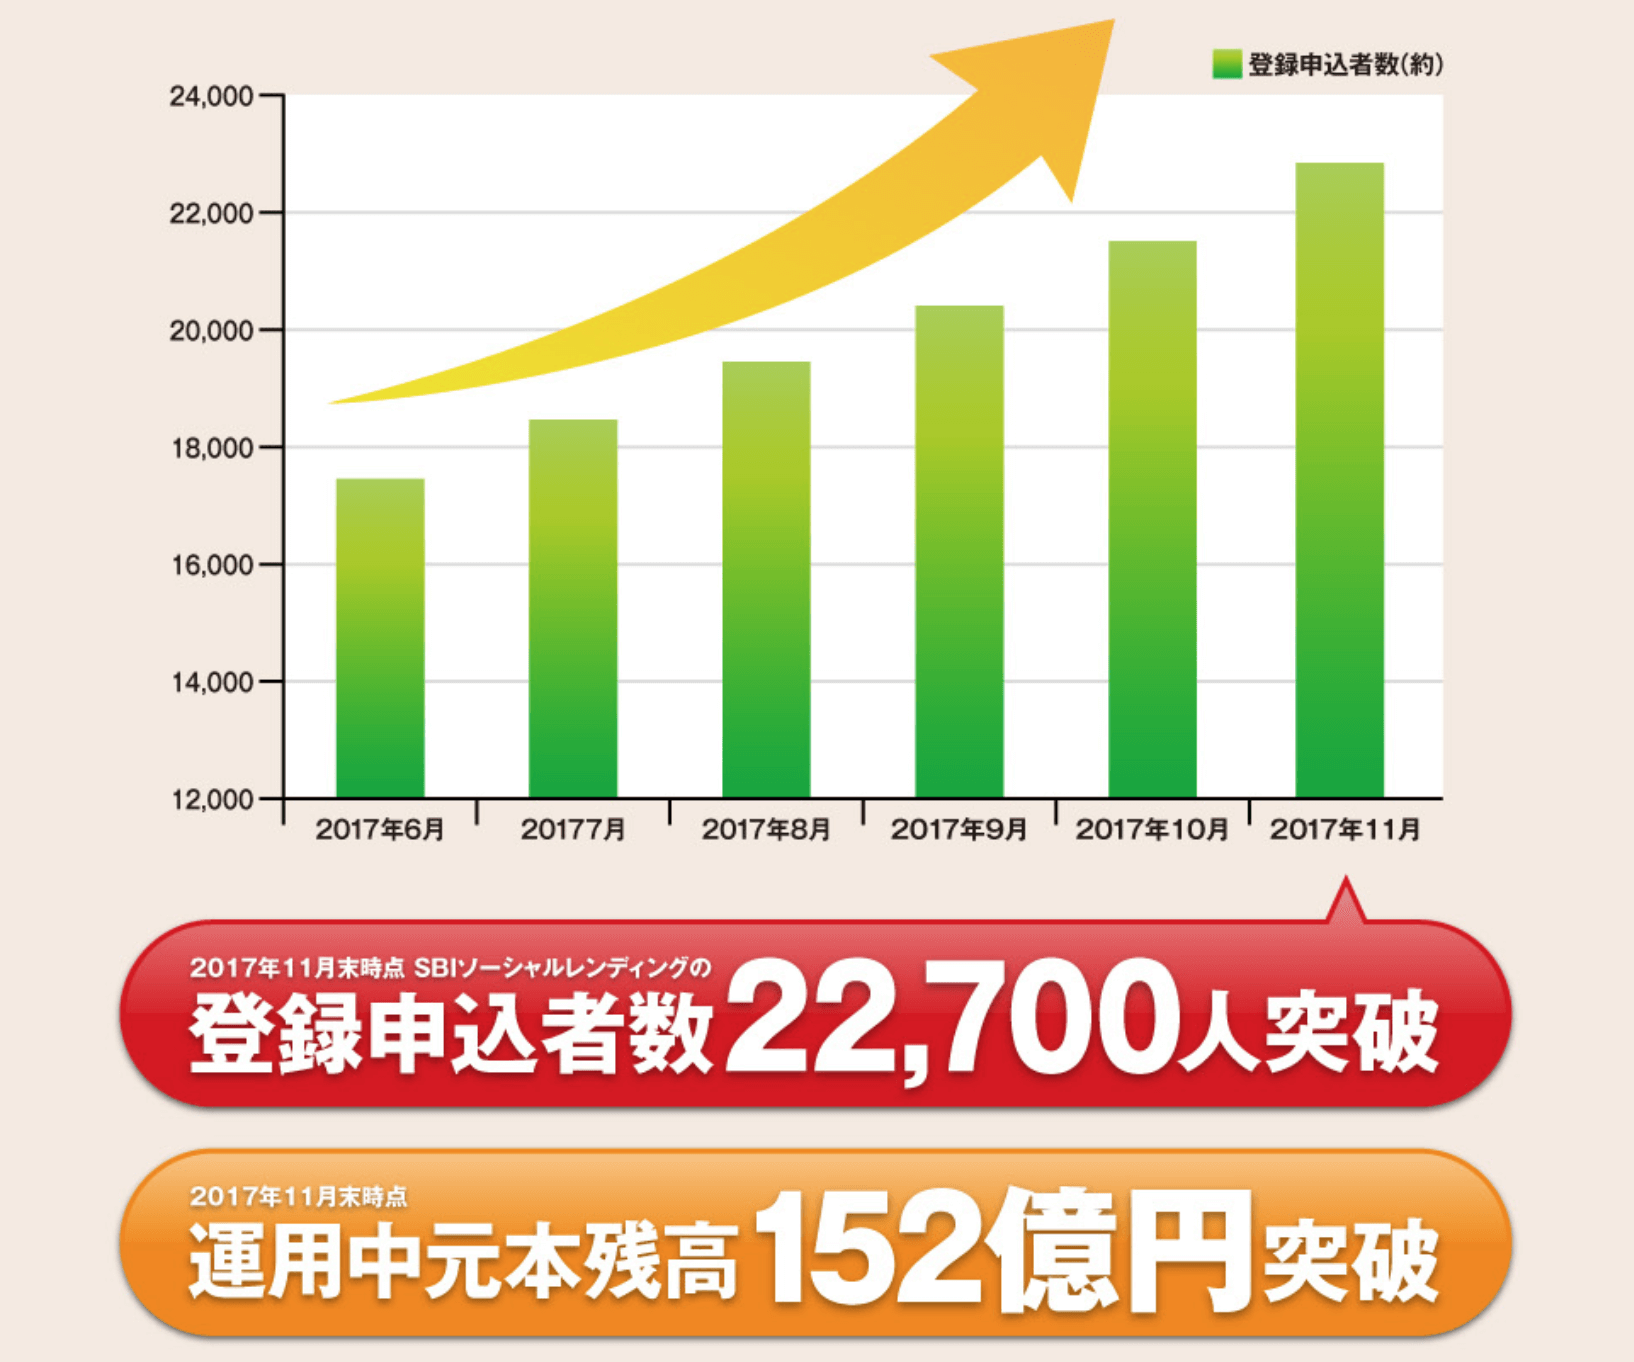 SBIソーシャルレンディング「成立ローン総額152億円・登録申込者数22,700人を突破」